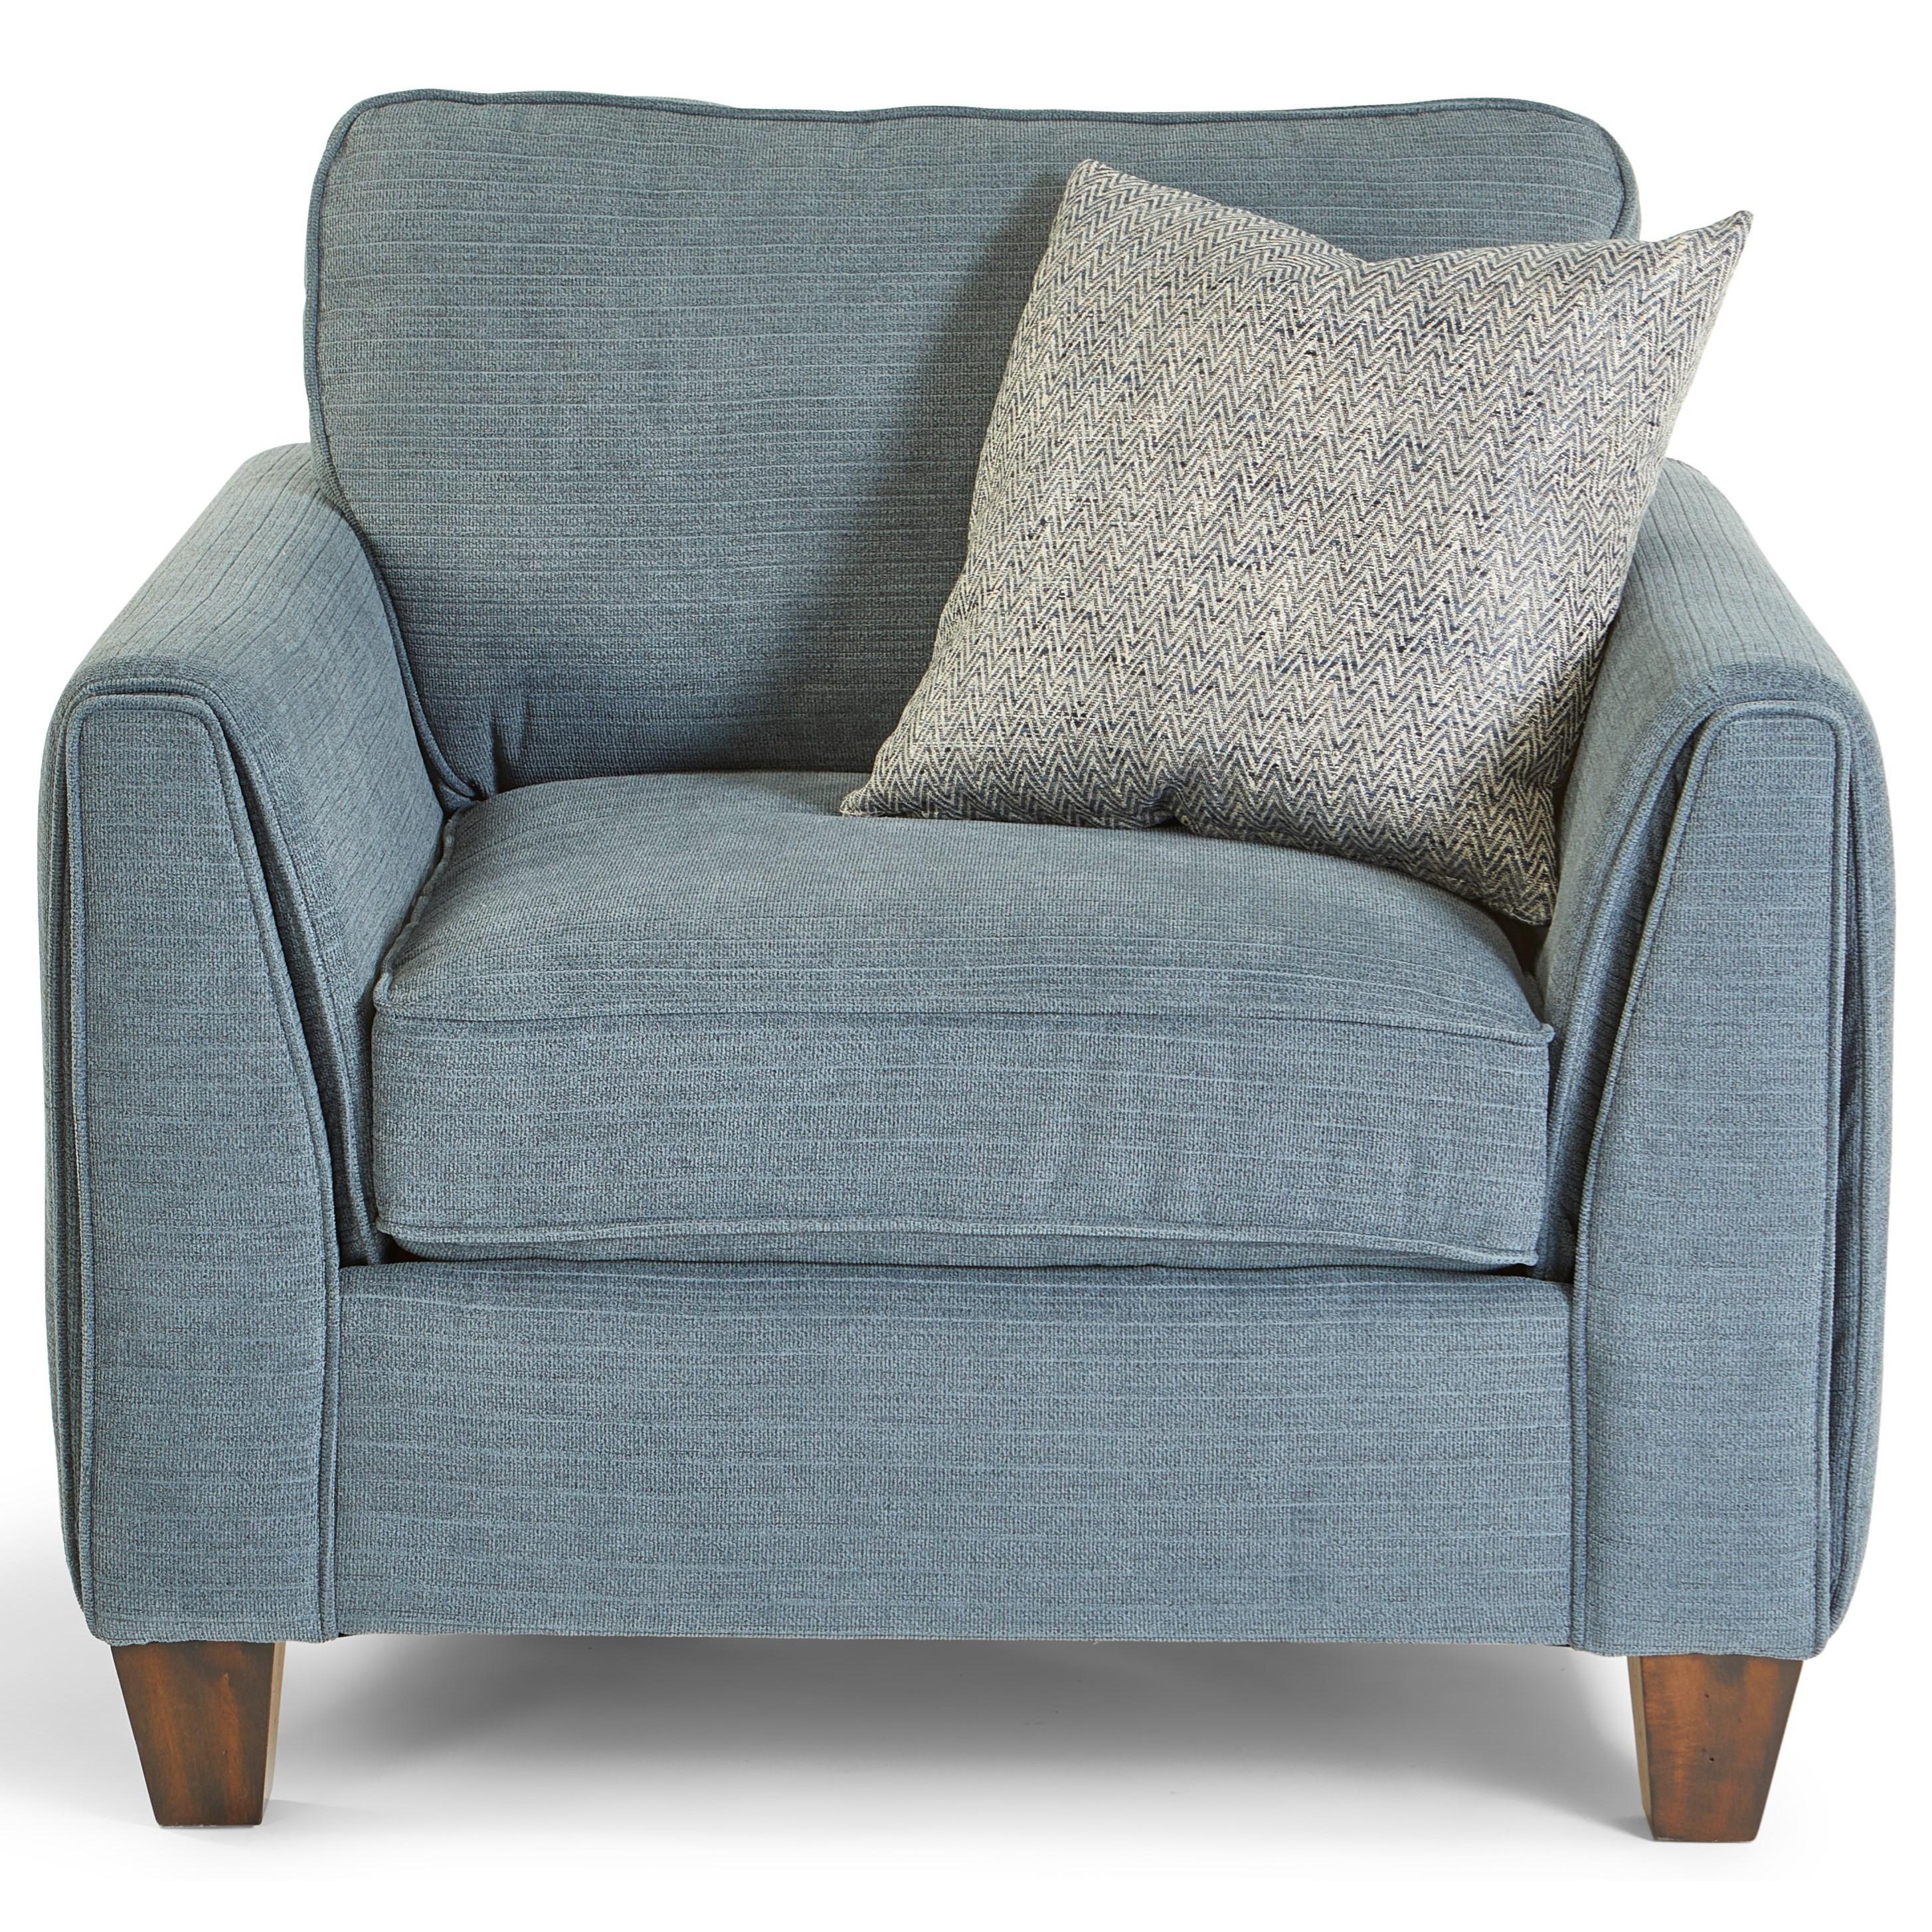 Bryce Arm Chair by Flexsteel at Jordan's Home Furnishings